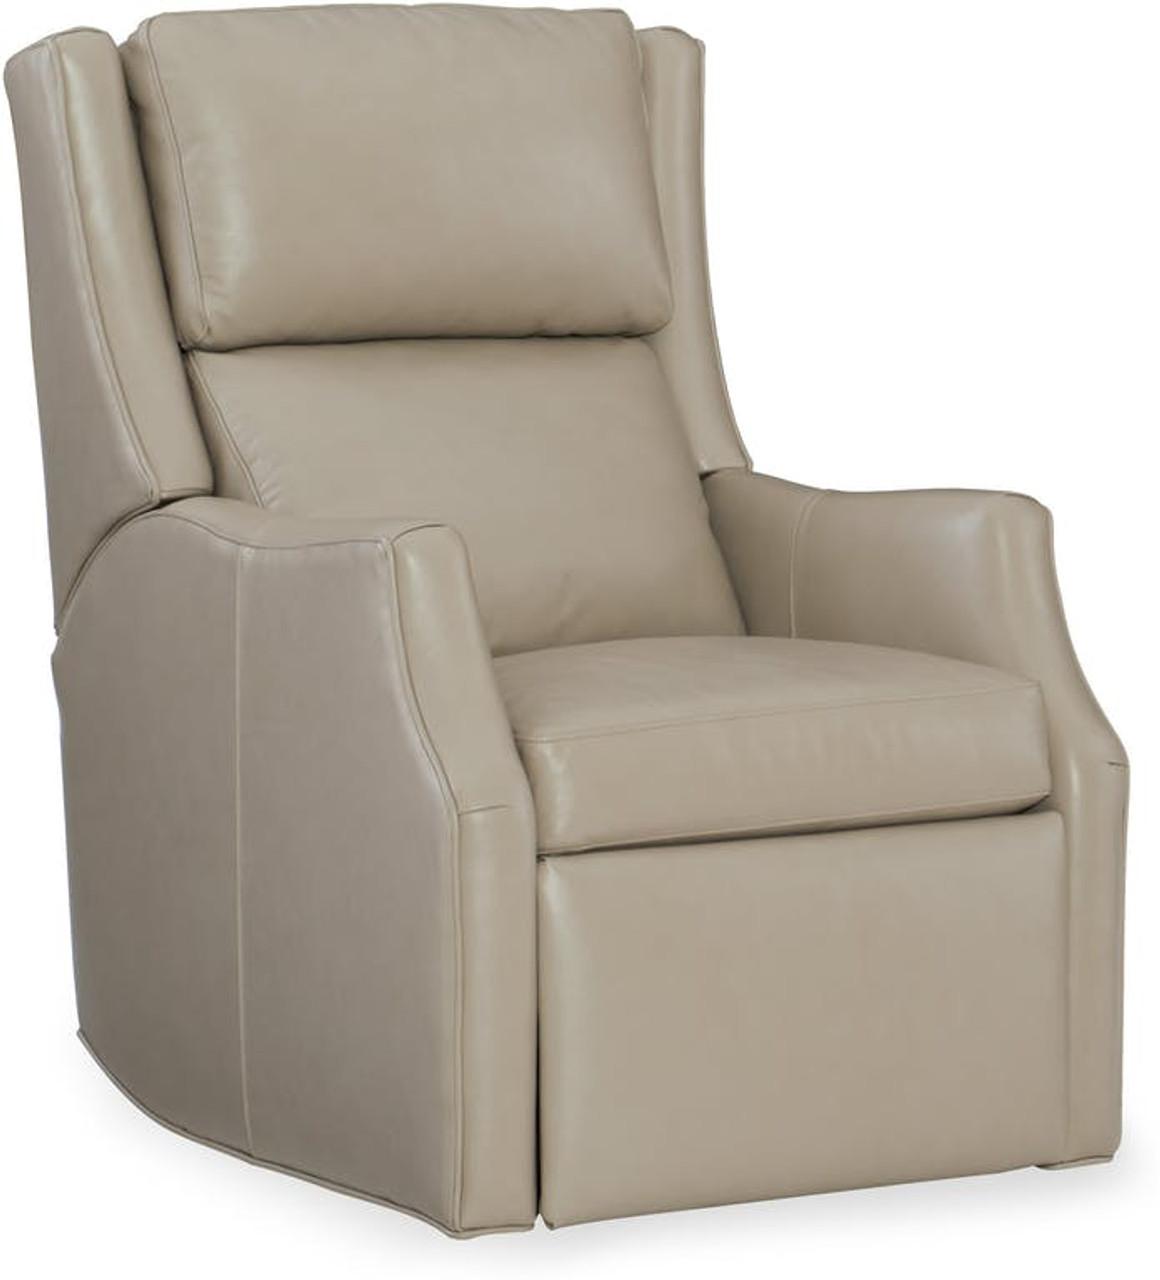 Superb Bradington Young 8010 Ryder Lift Recliner Inzonedesignstudio Interior Chair Design Inzonedesignstudiocom